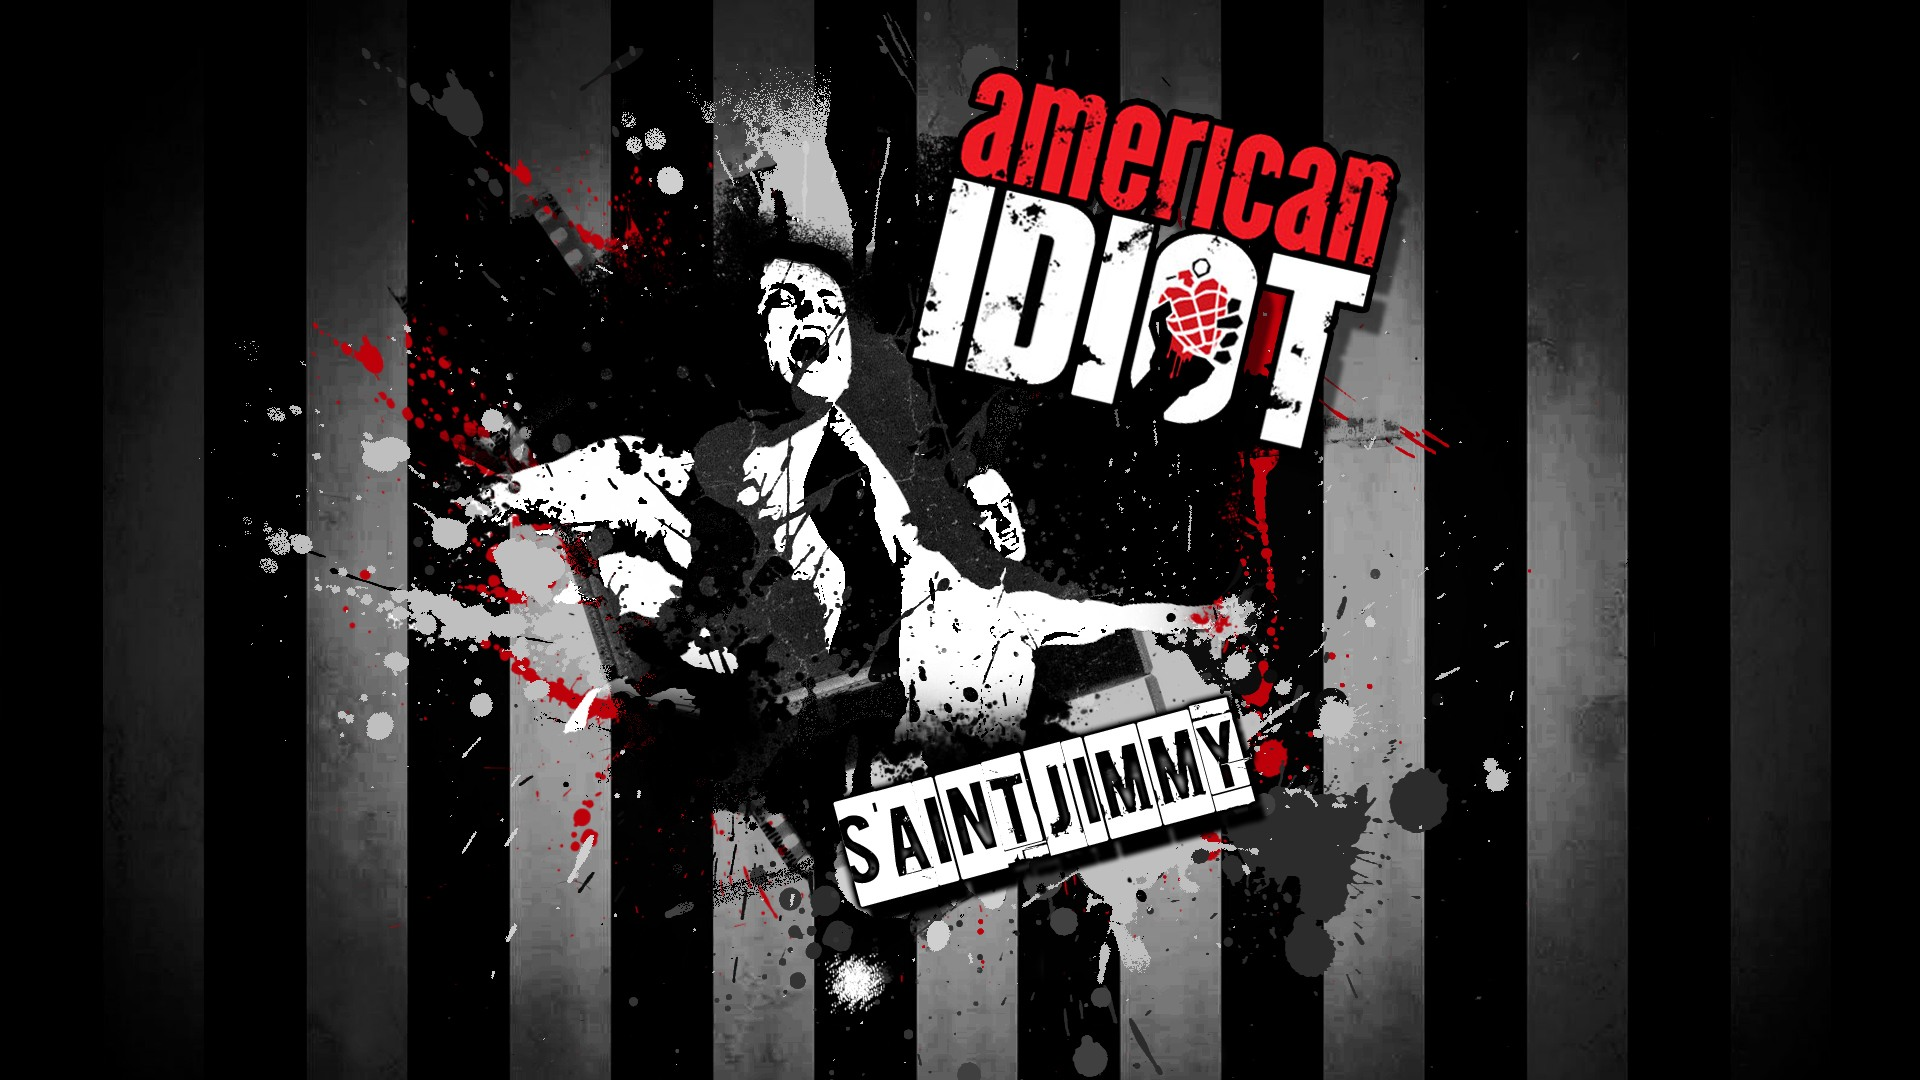 green day american idiot full album mp3 free download